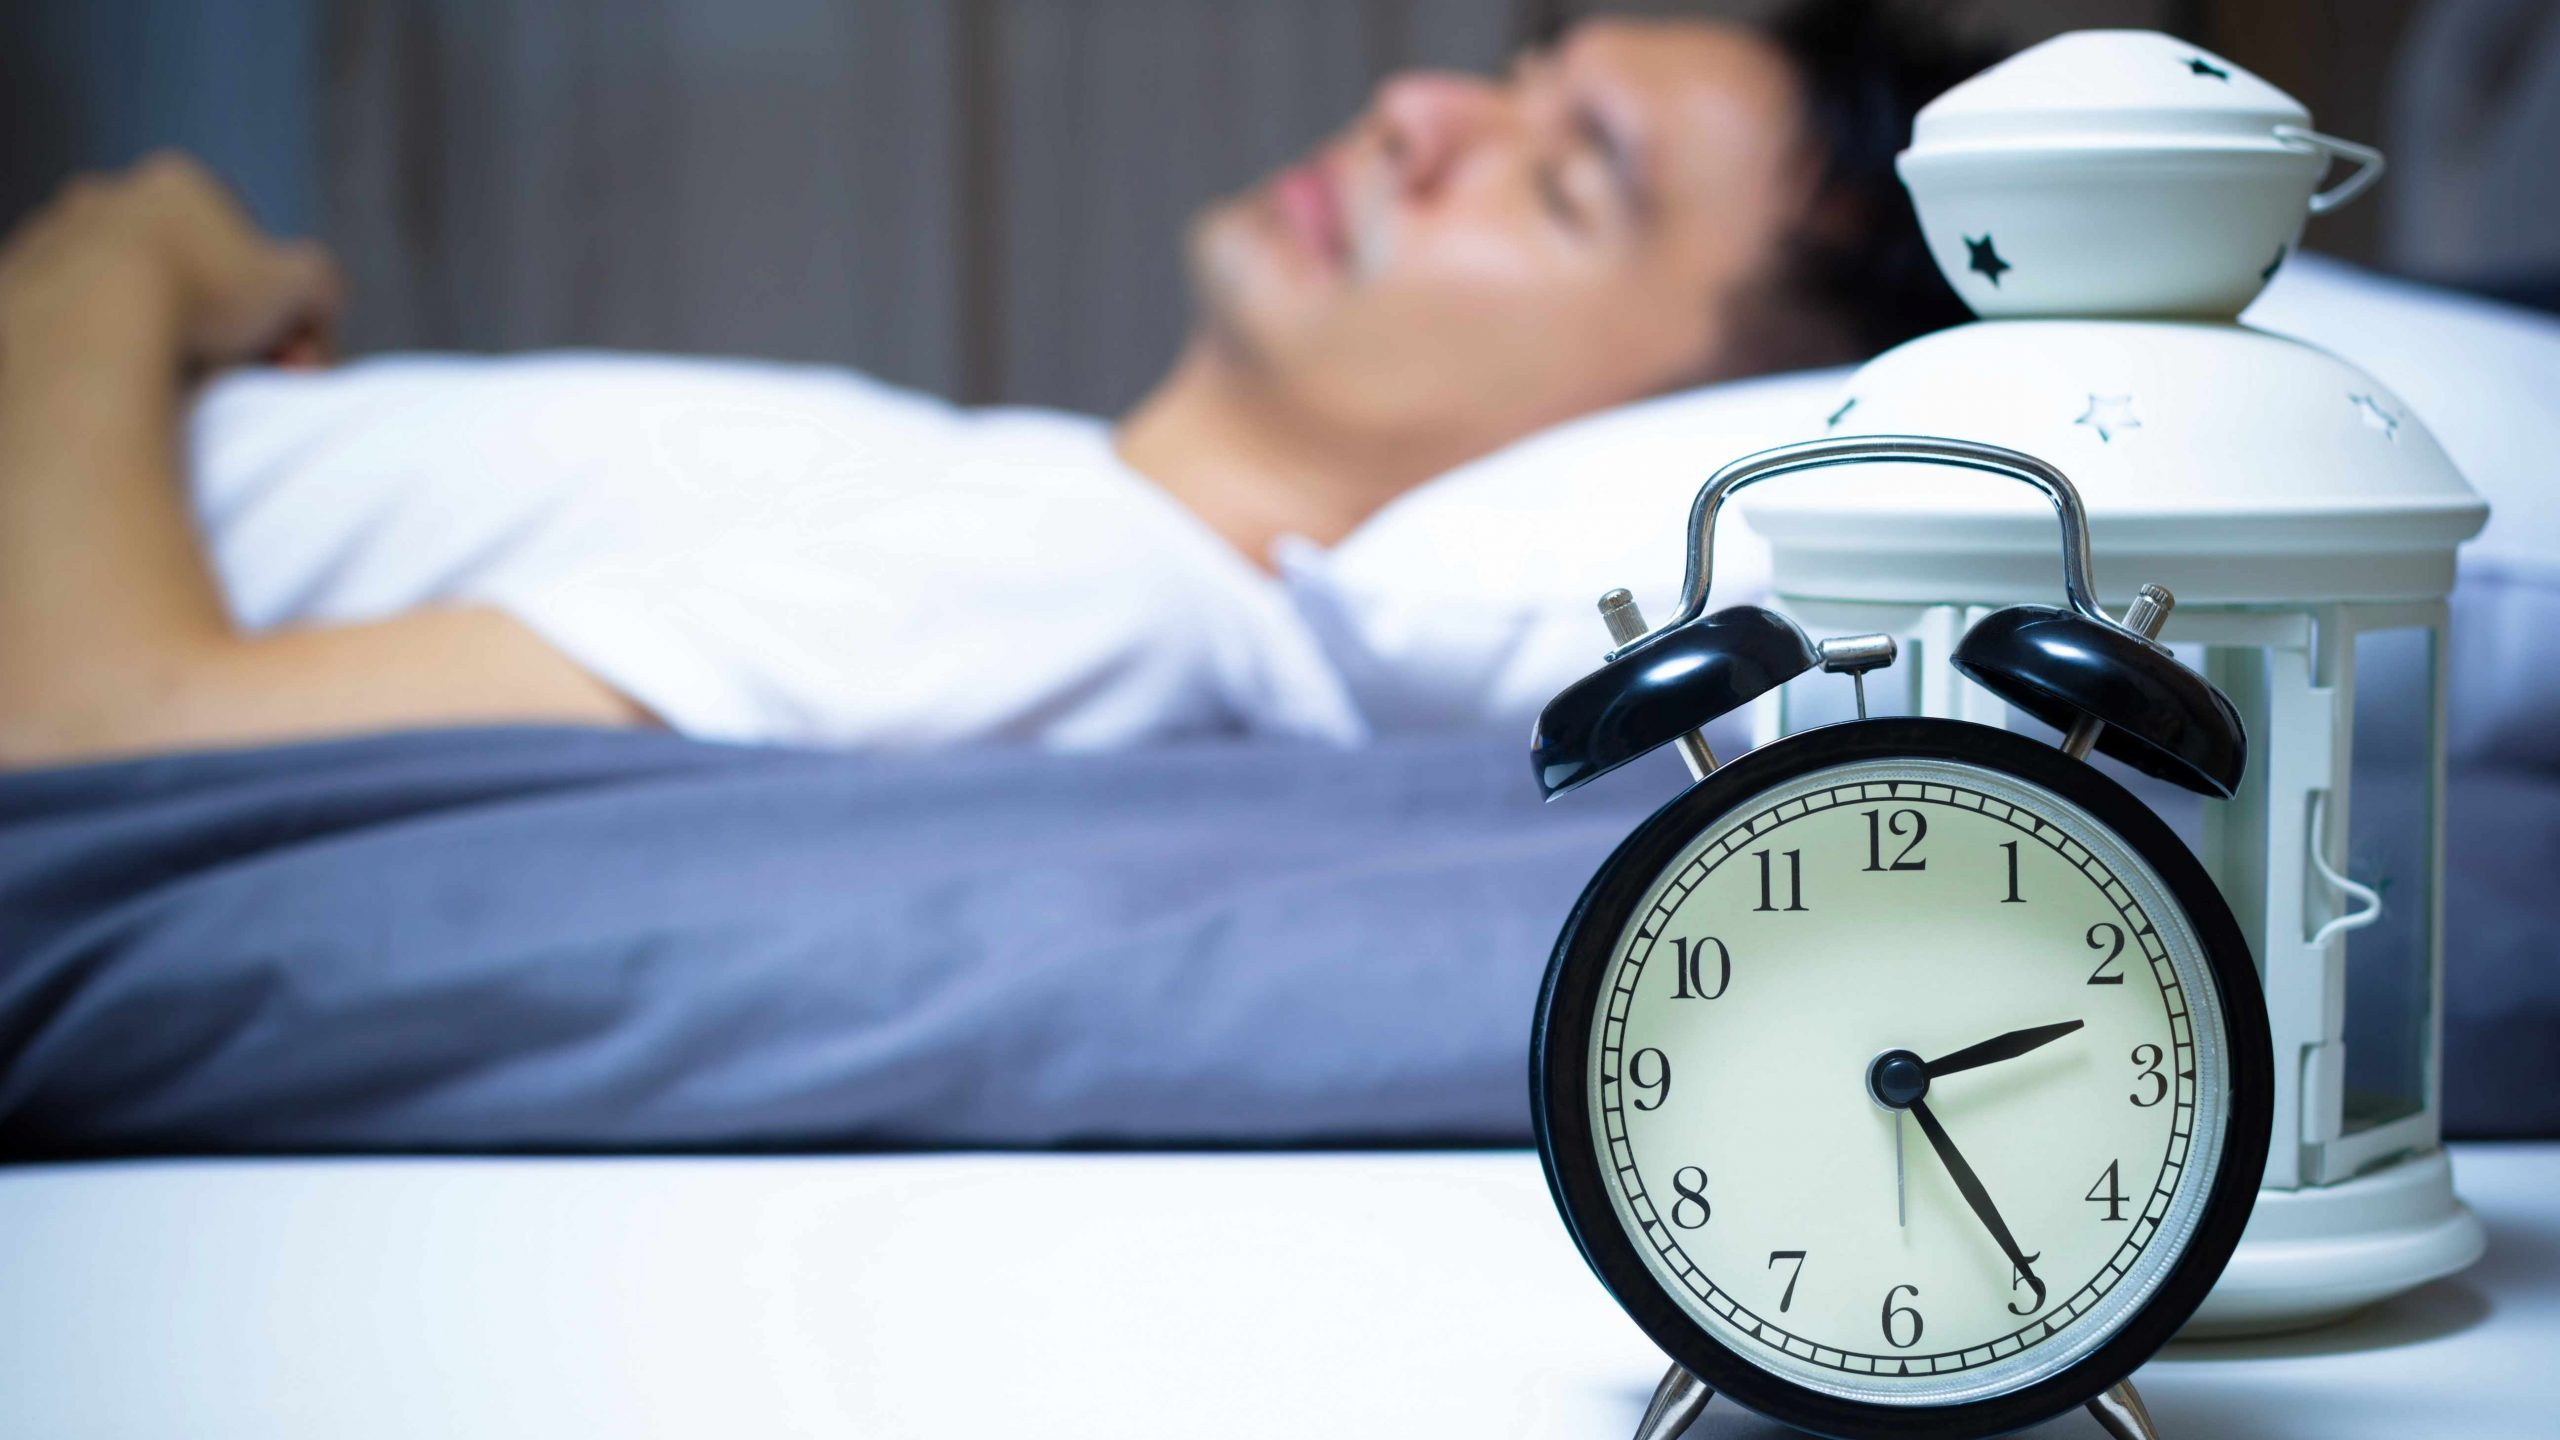 mayo-clinic-minute:-daylight-saving-time-ends-nov.-1